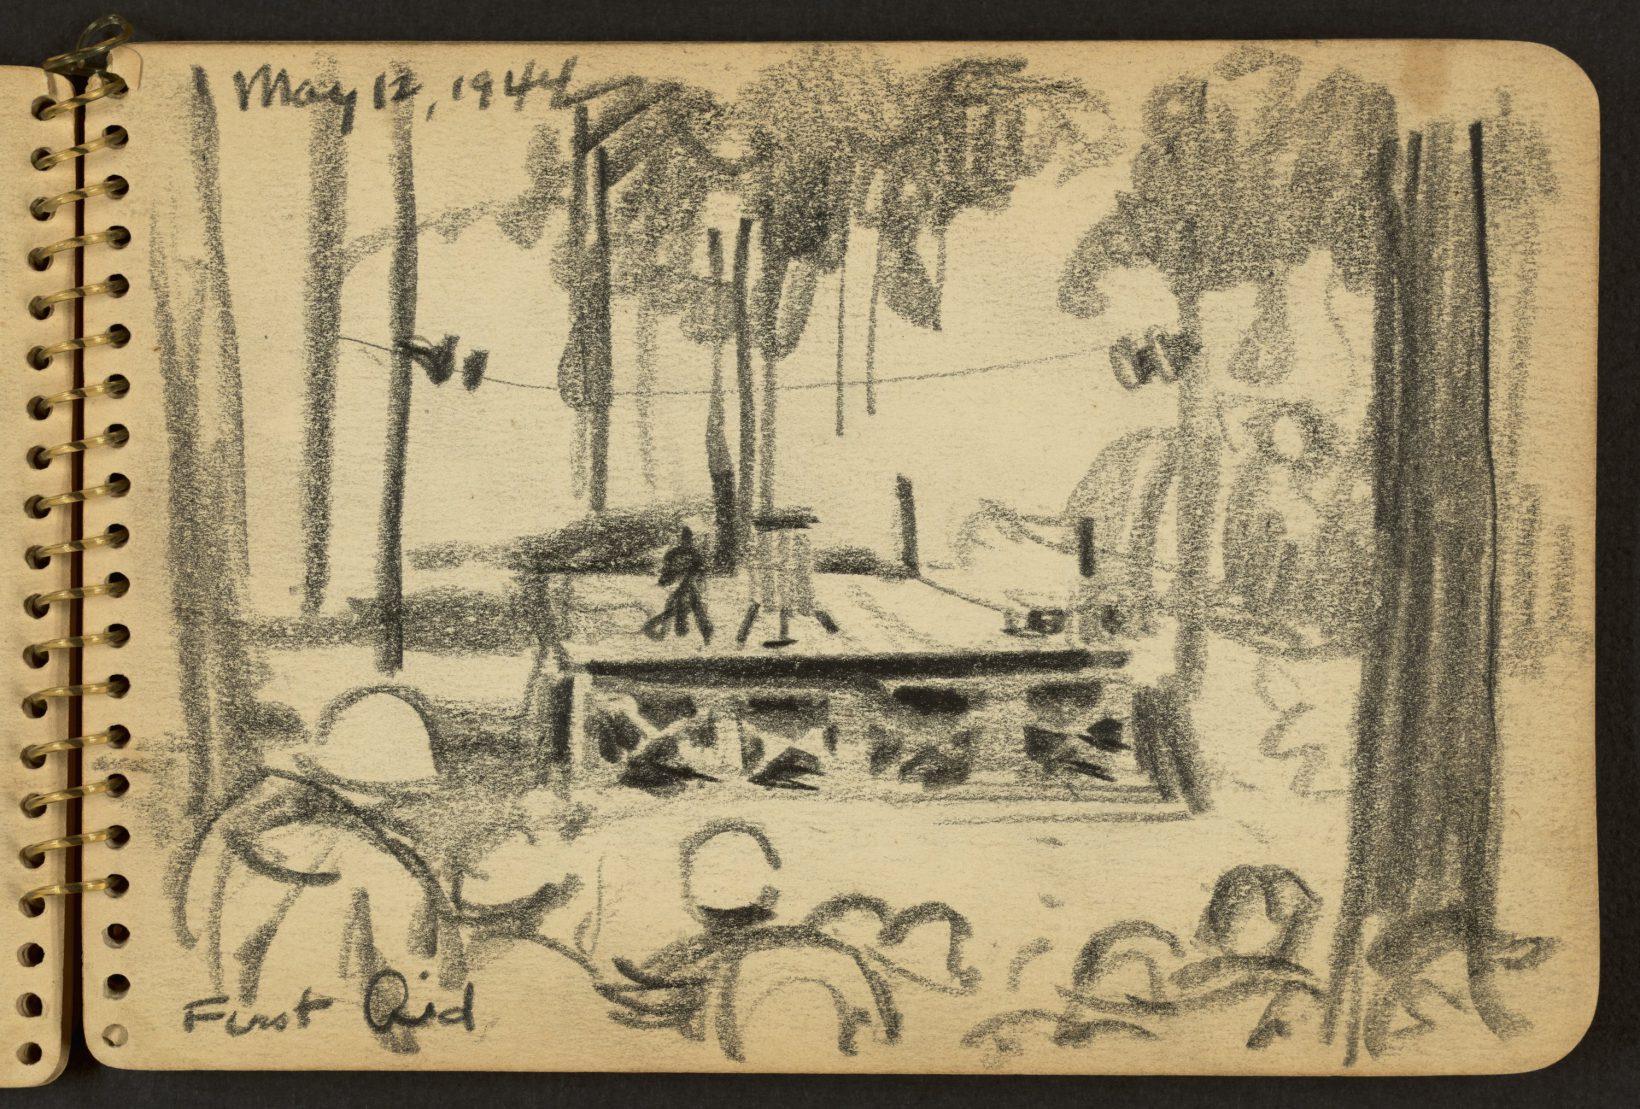 victor-lundy-carnet-croquis-seconde-guerre-mondiale-04